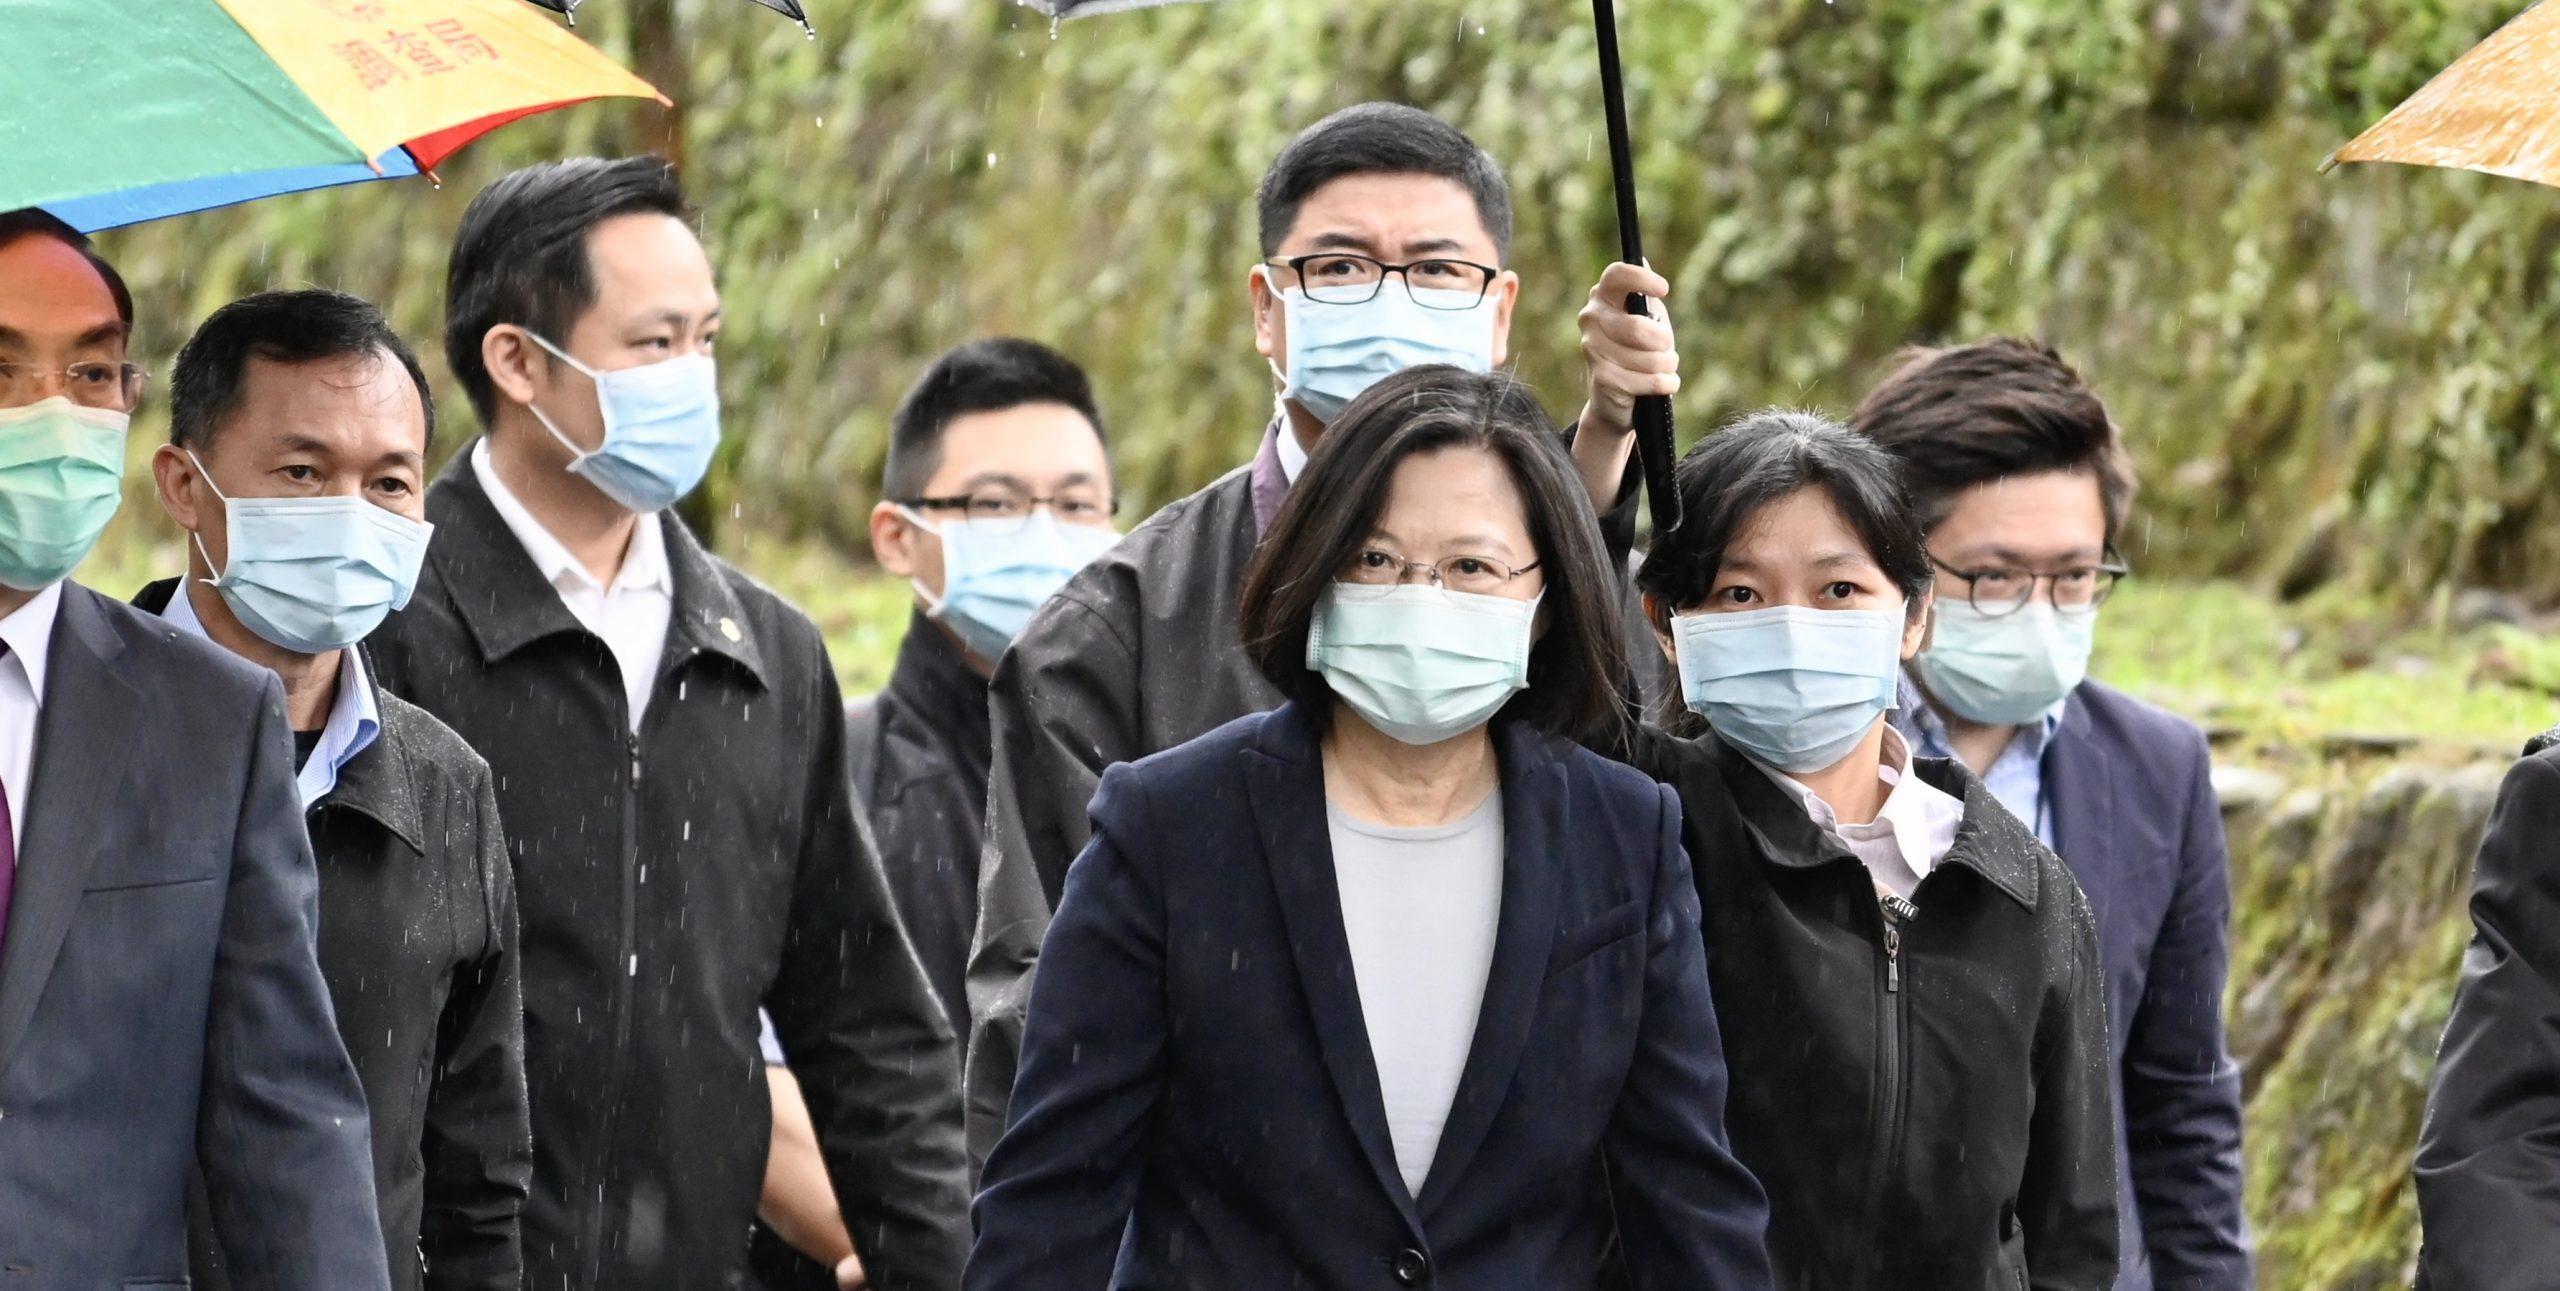 La président taïwanaise Tsai Ing-wen le 24 avril 2020 à Taipei. (Source : Iowa Public Radio)